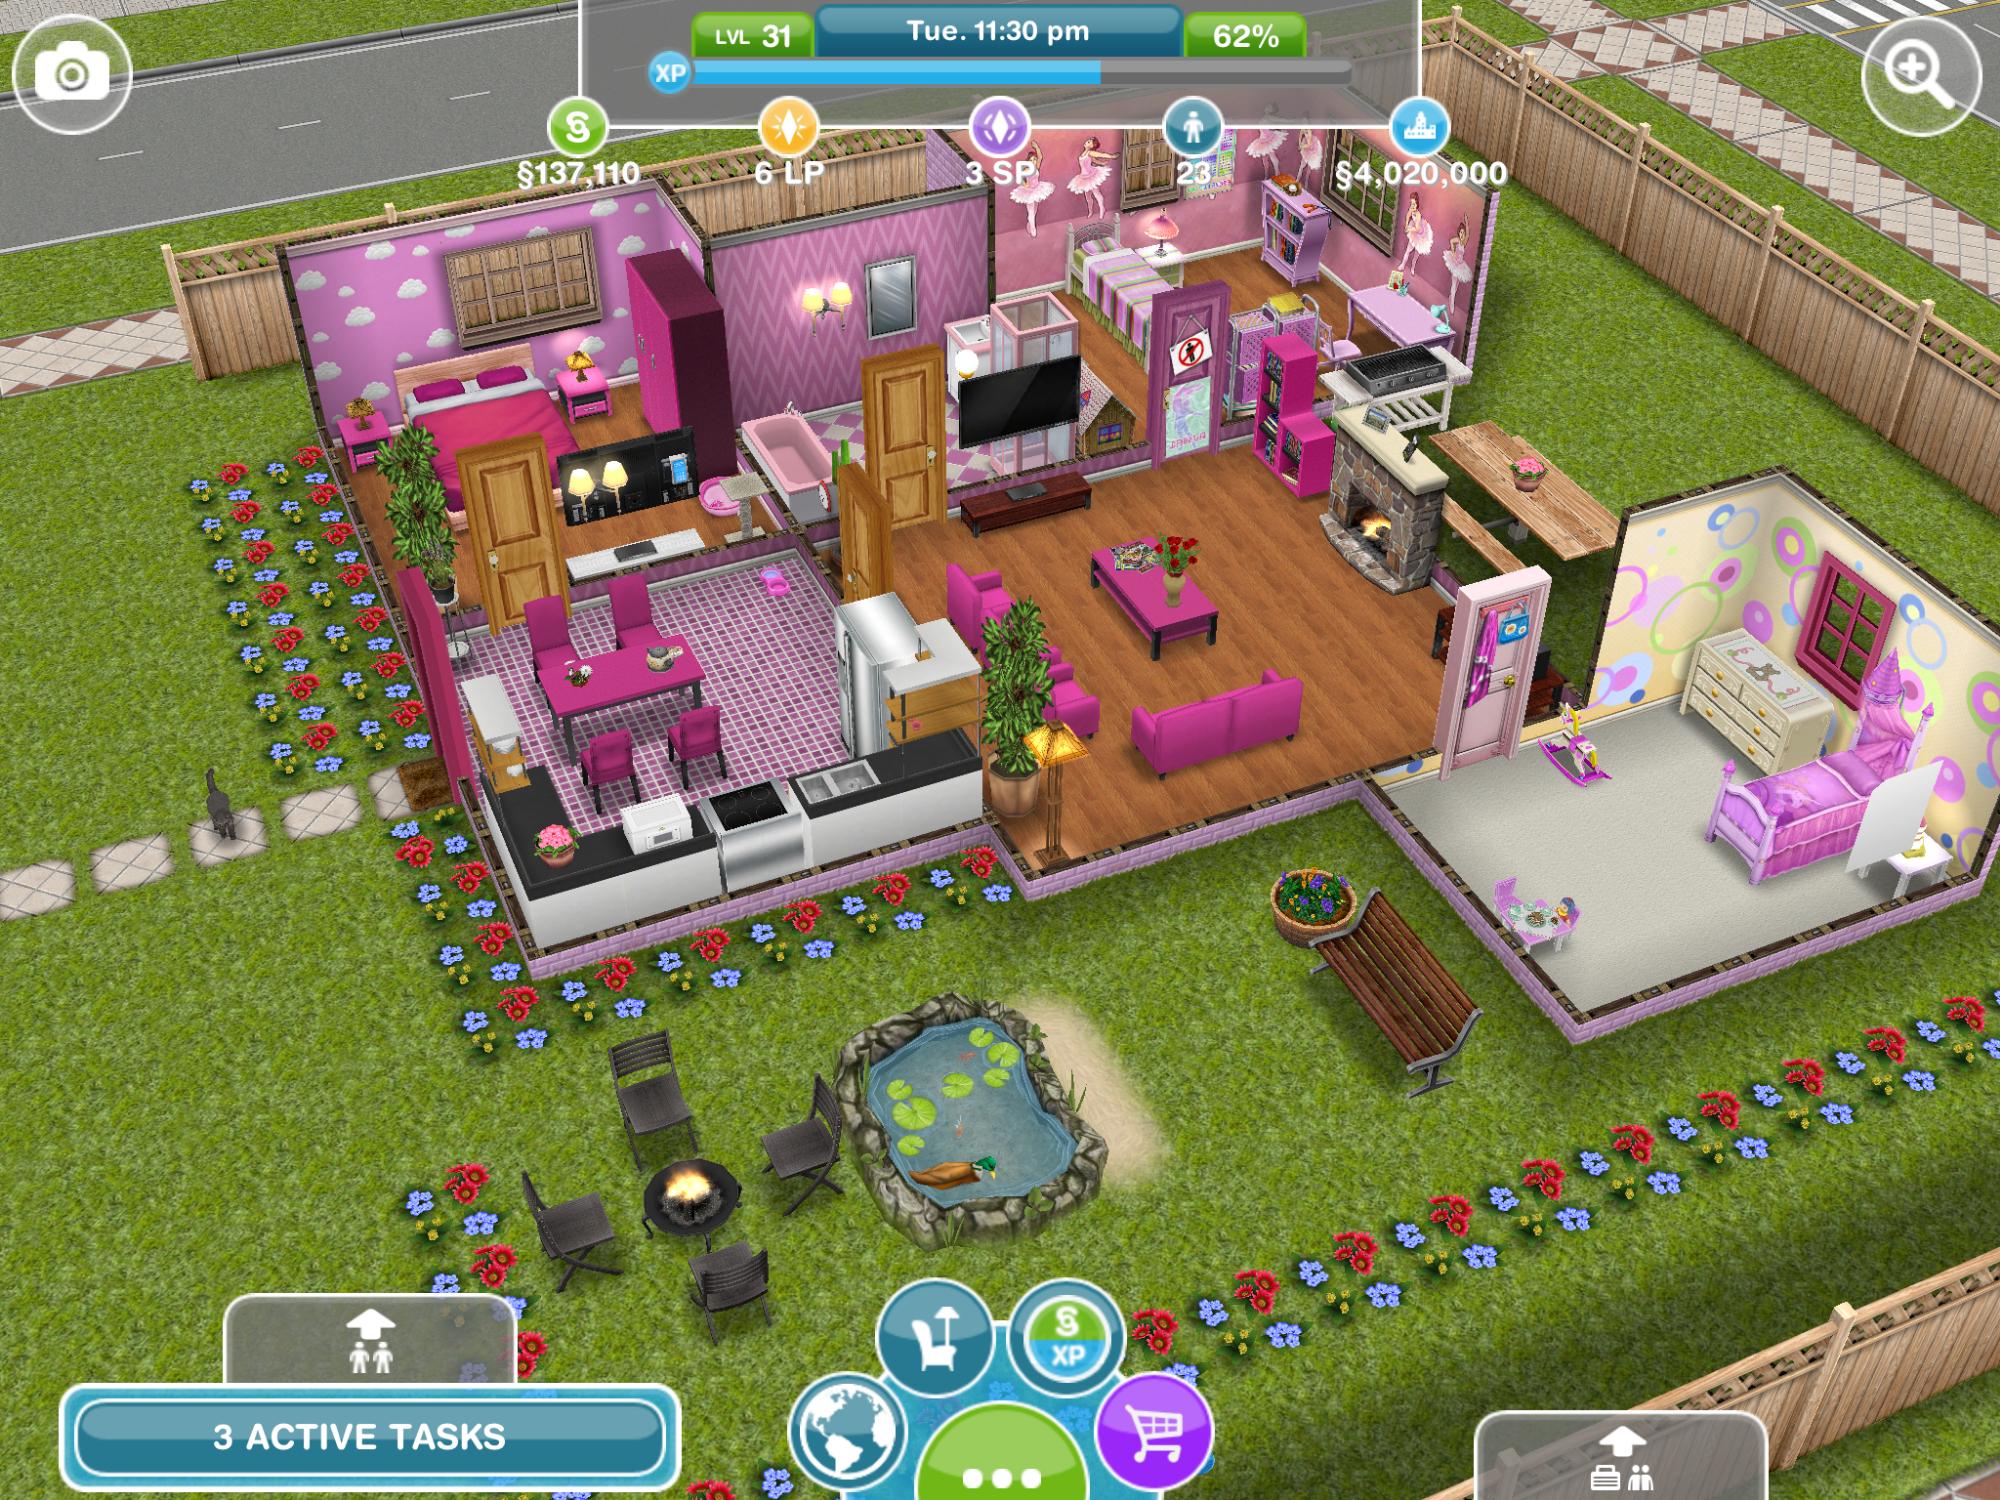 Beautiful Sims Freeplay Homes Designs Photos - Interior Design ...